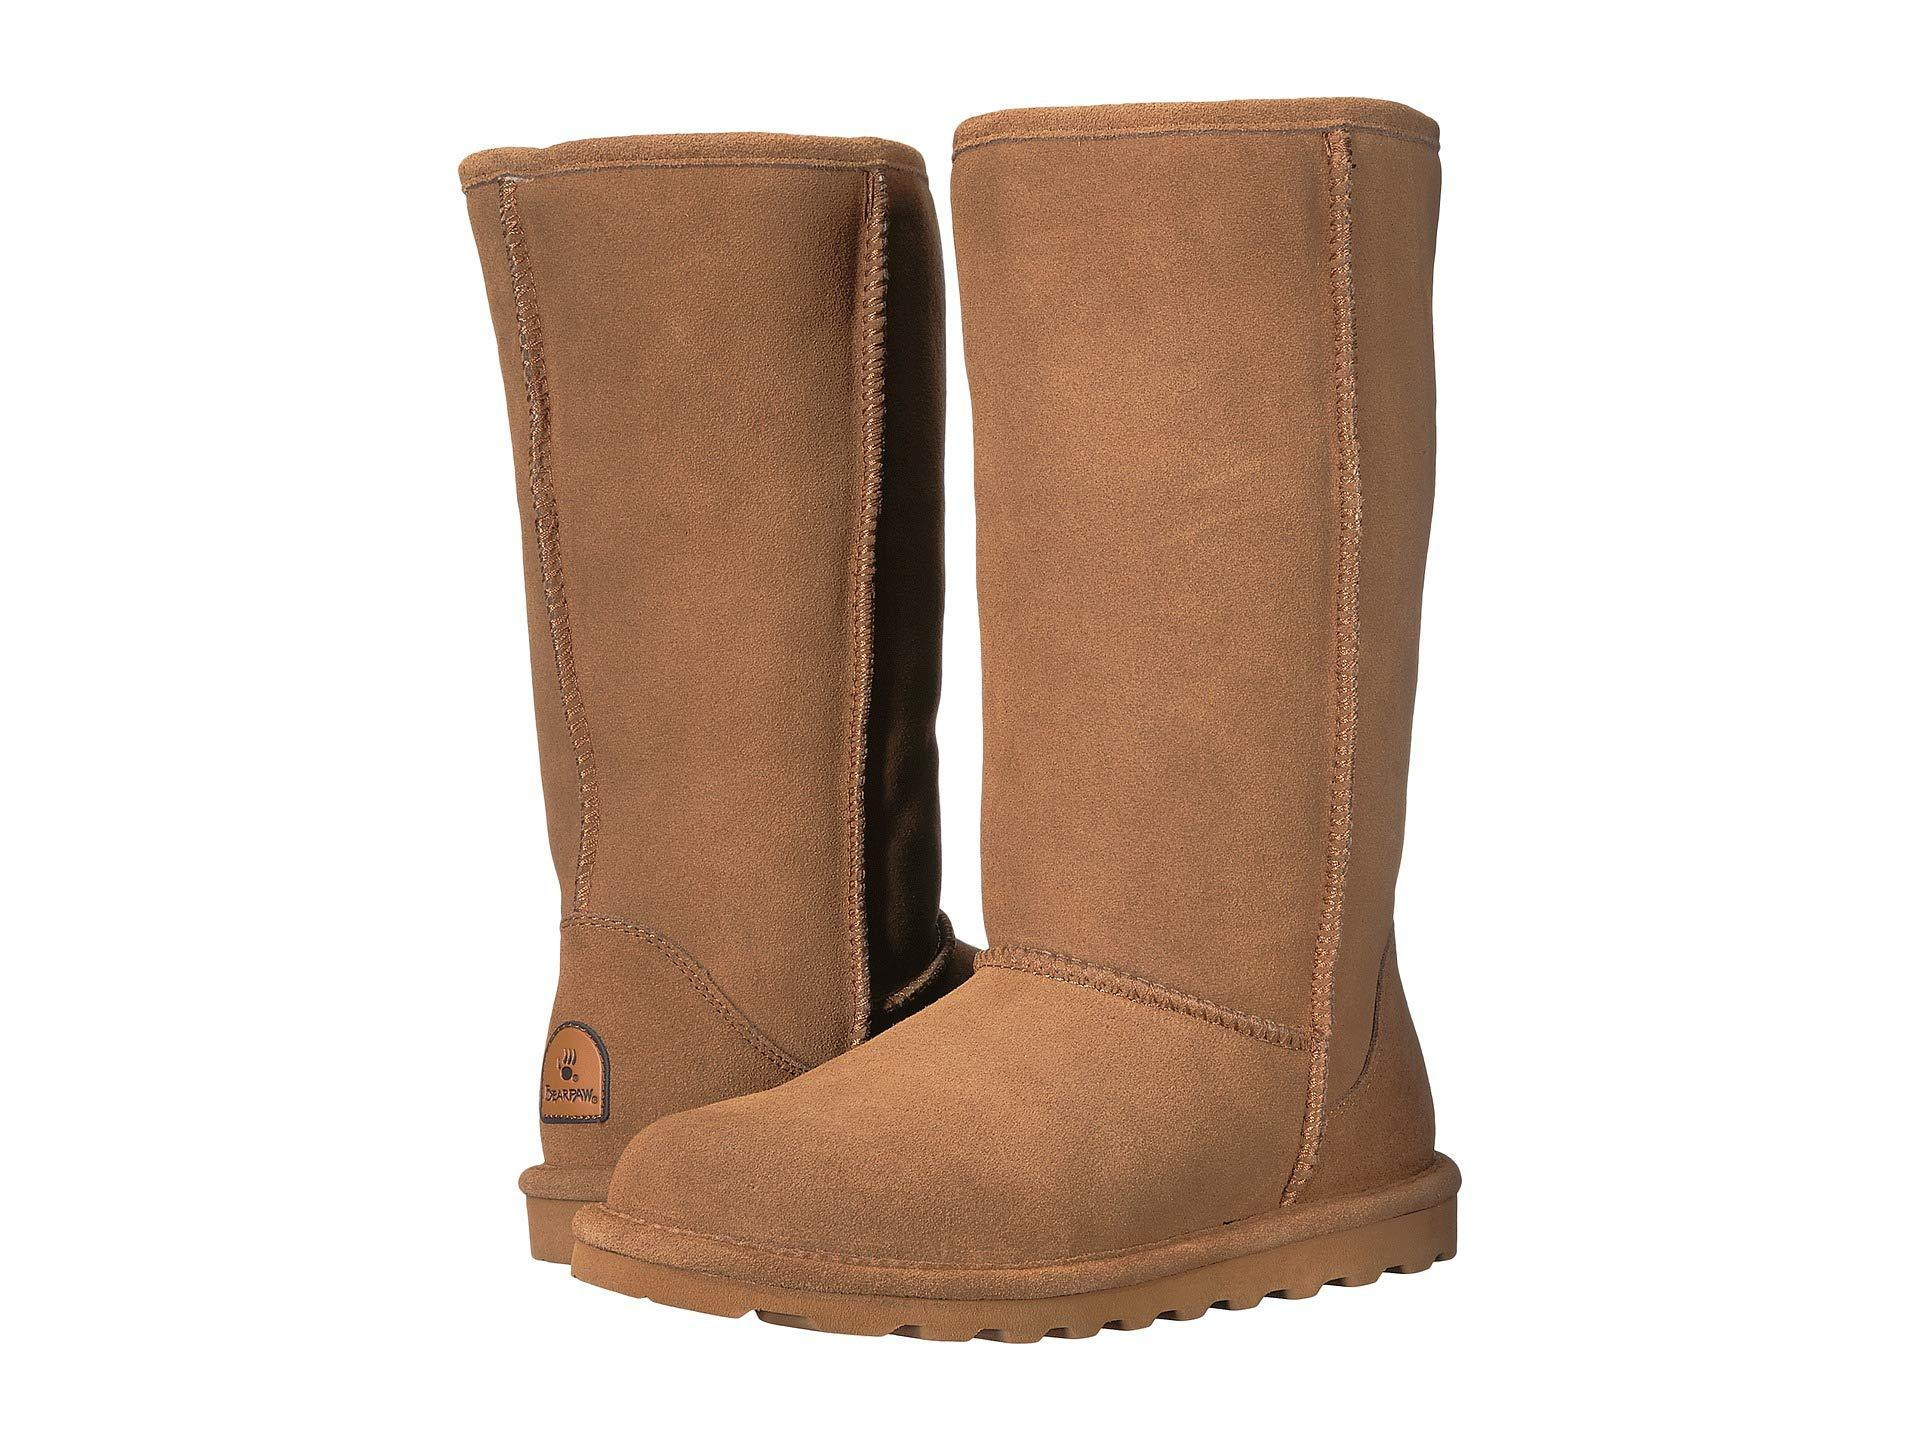 b8e3bb8c67a0 Lyst - BEARPAW Elle Tall (black) Women s Shoes in Brown